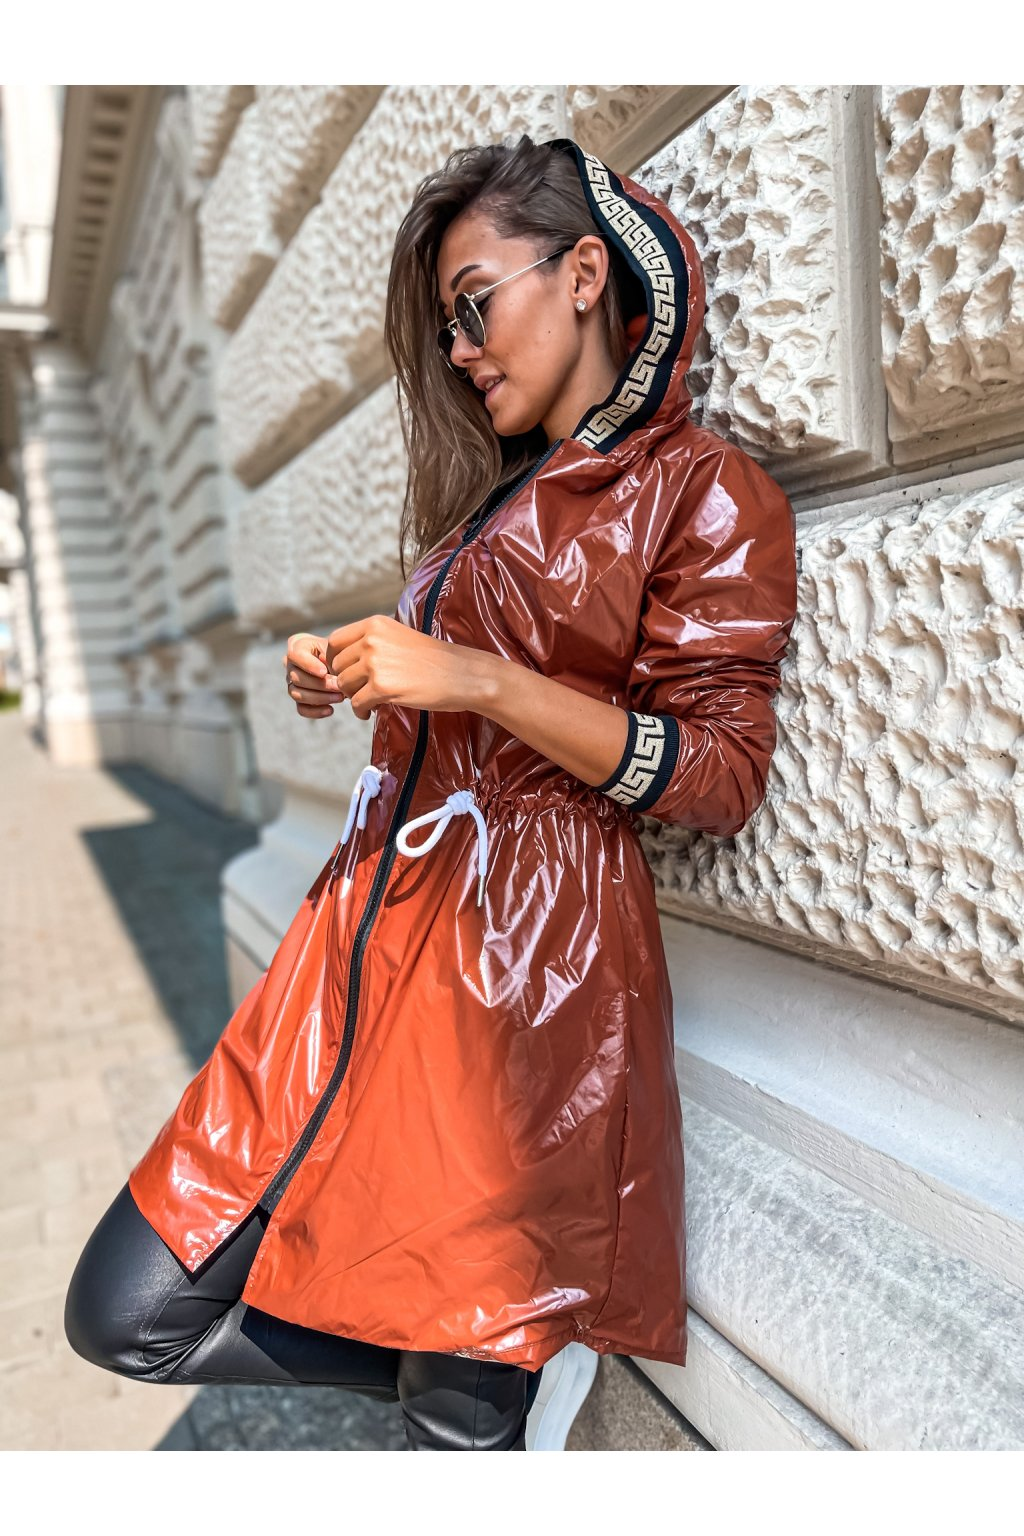 damska prodlouzena bunda verra brown eshopat cz 1